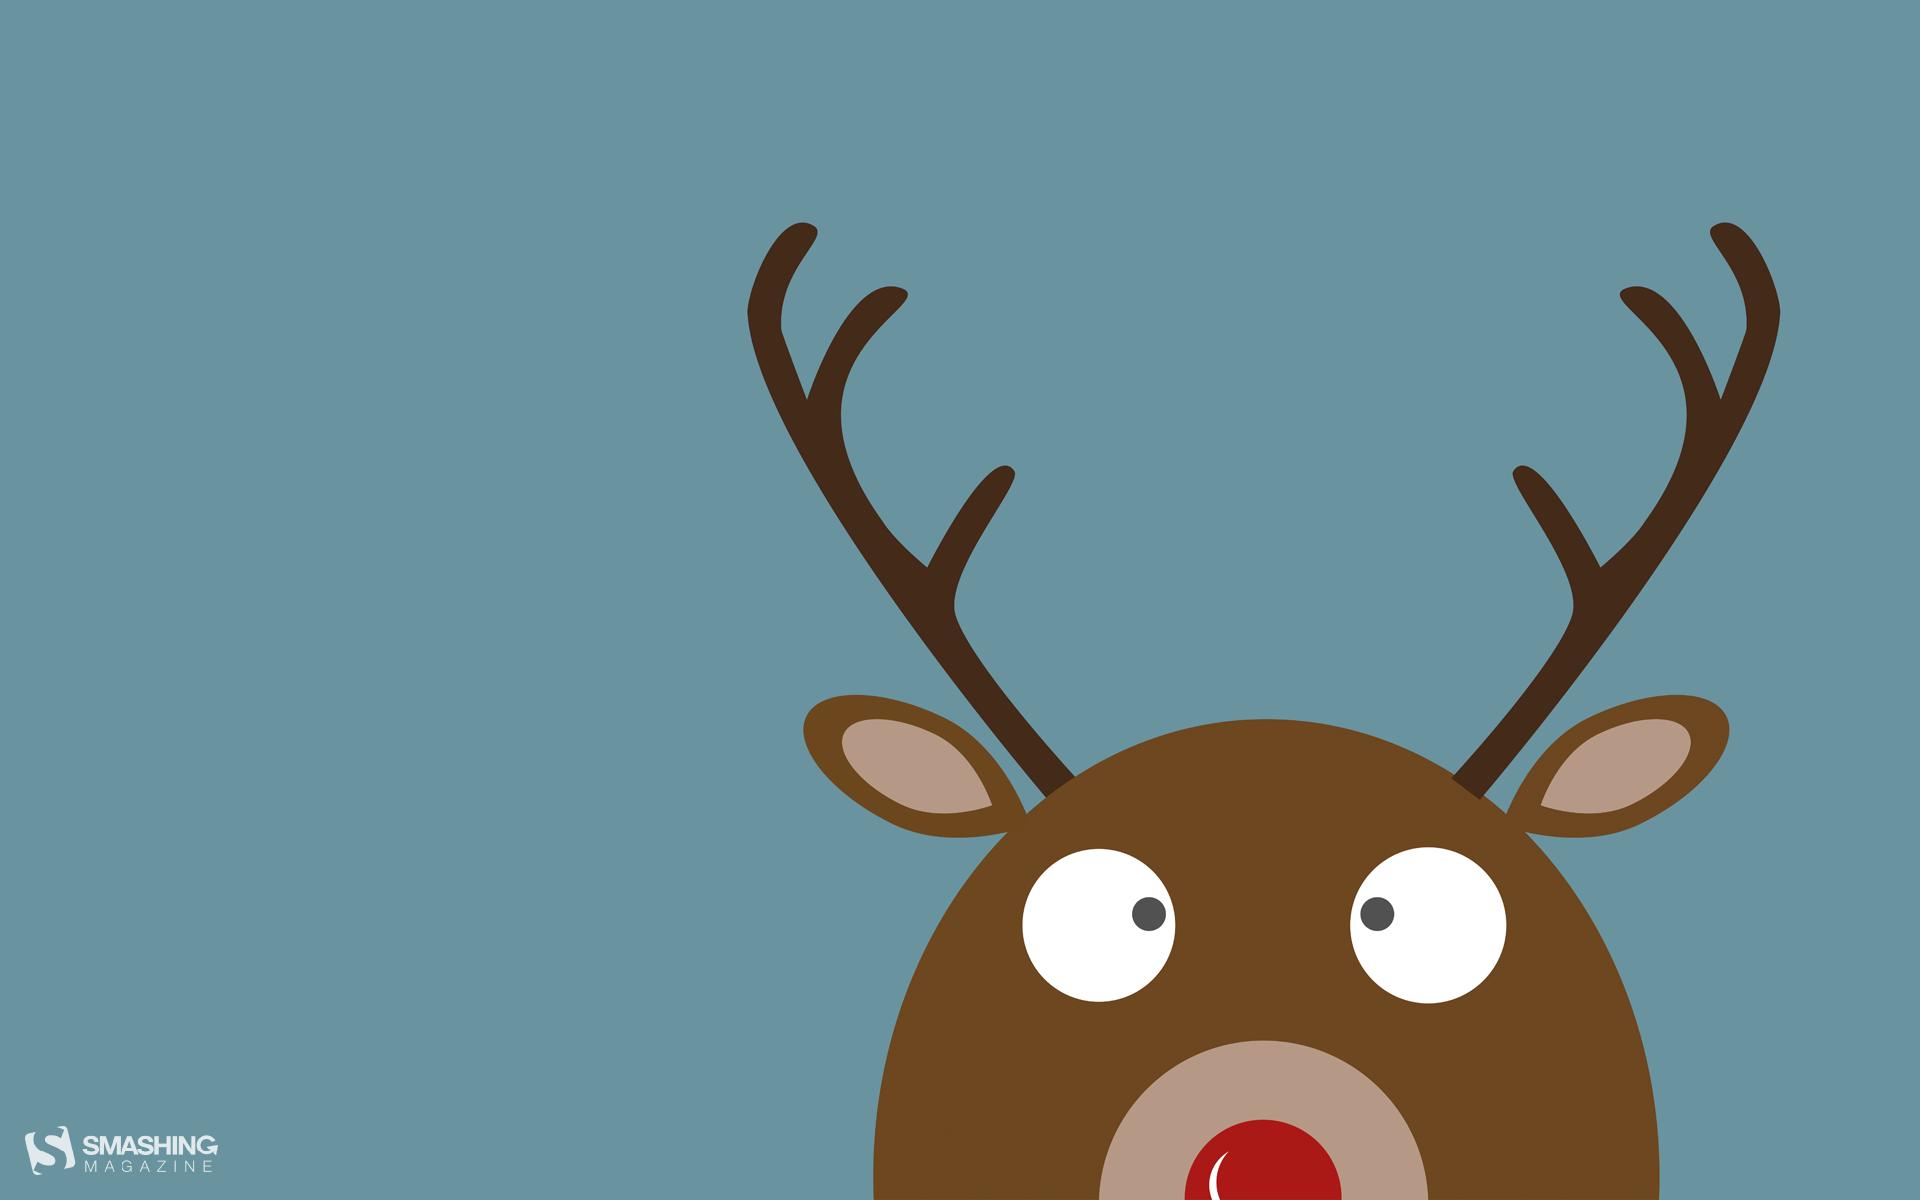 Desktop wallpaper calendars december 2013 christmas for Minimalist christmas